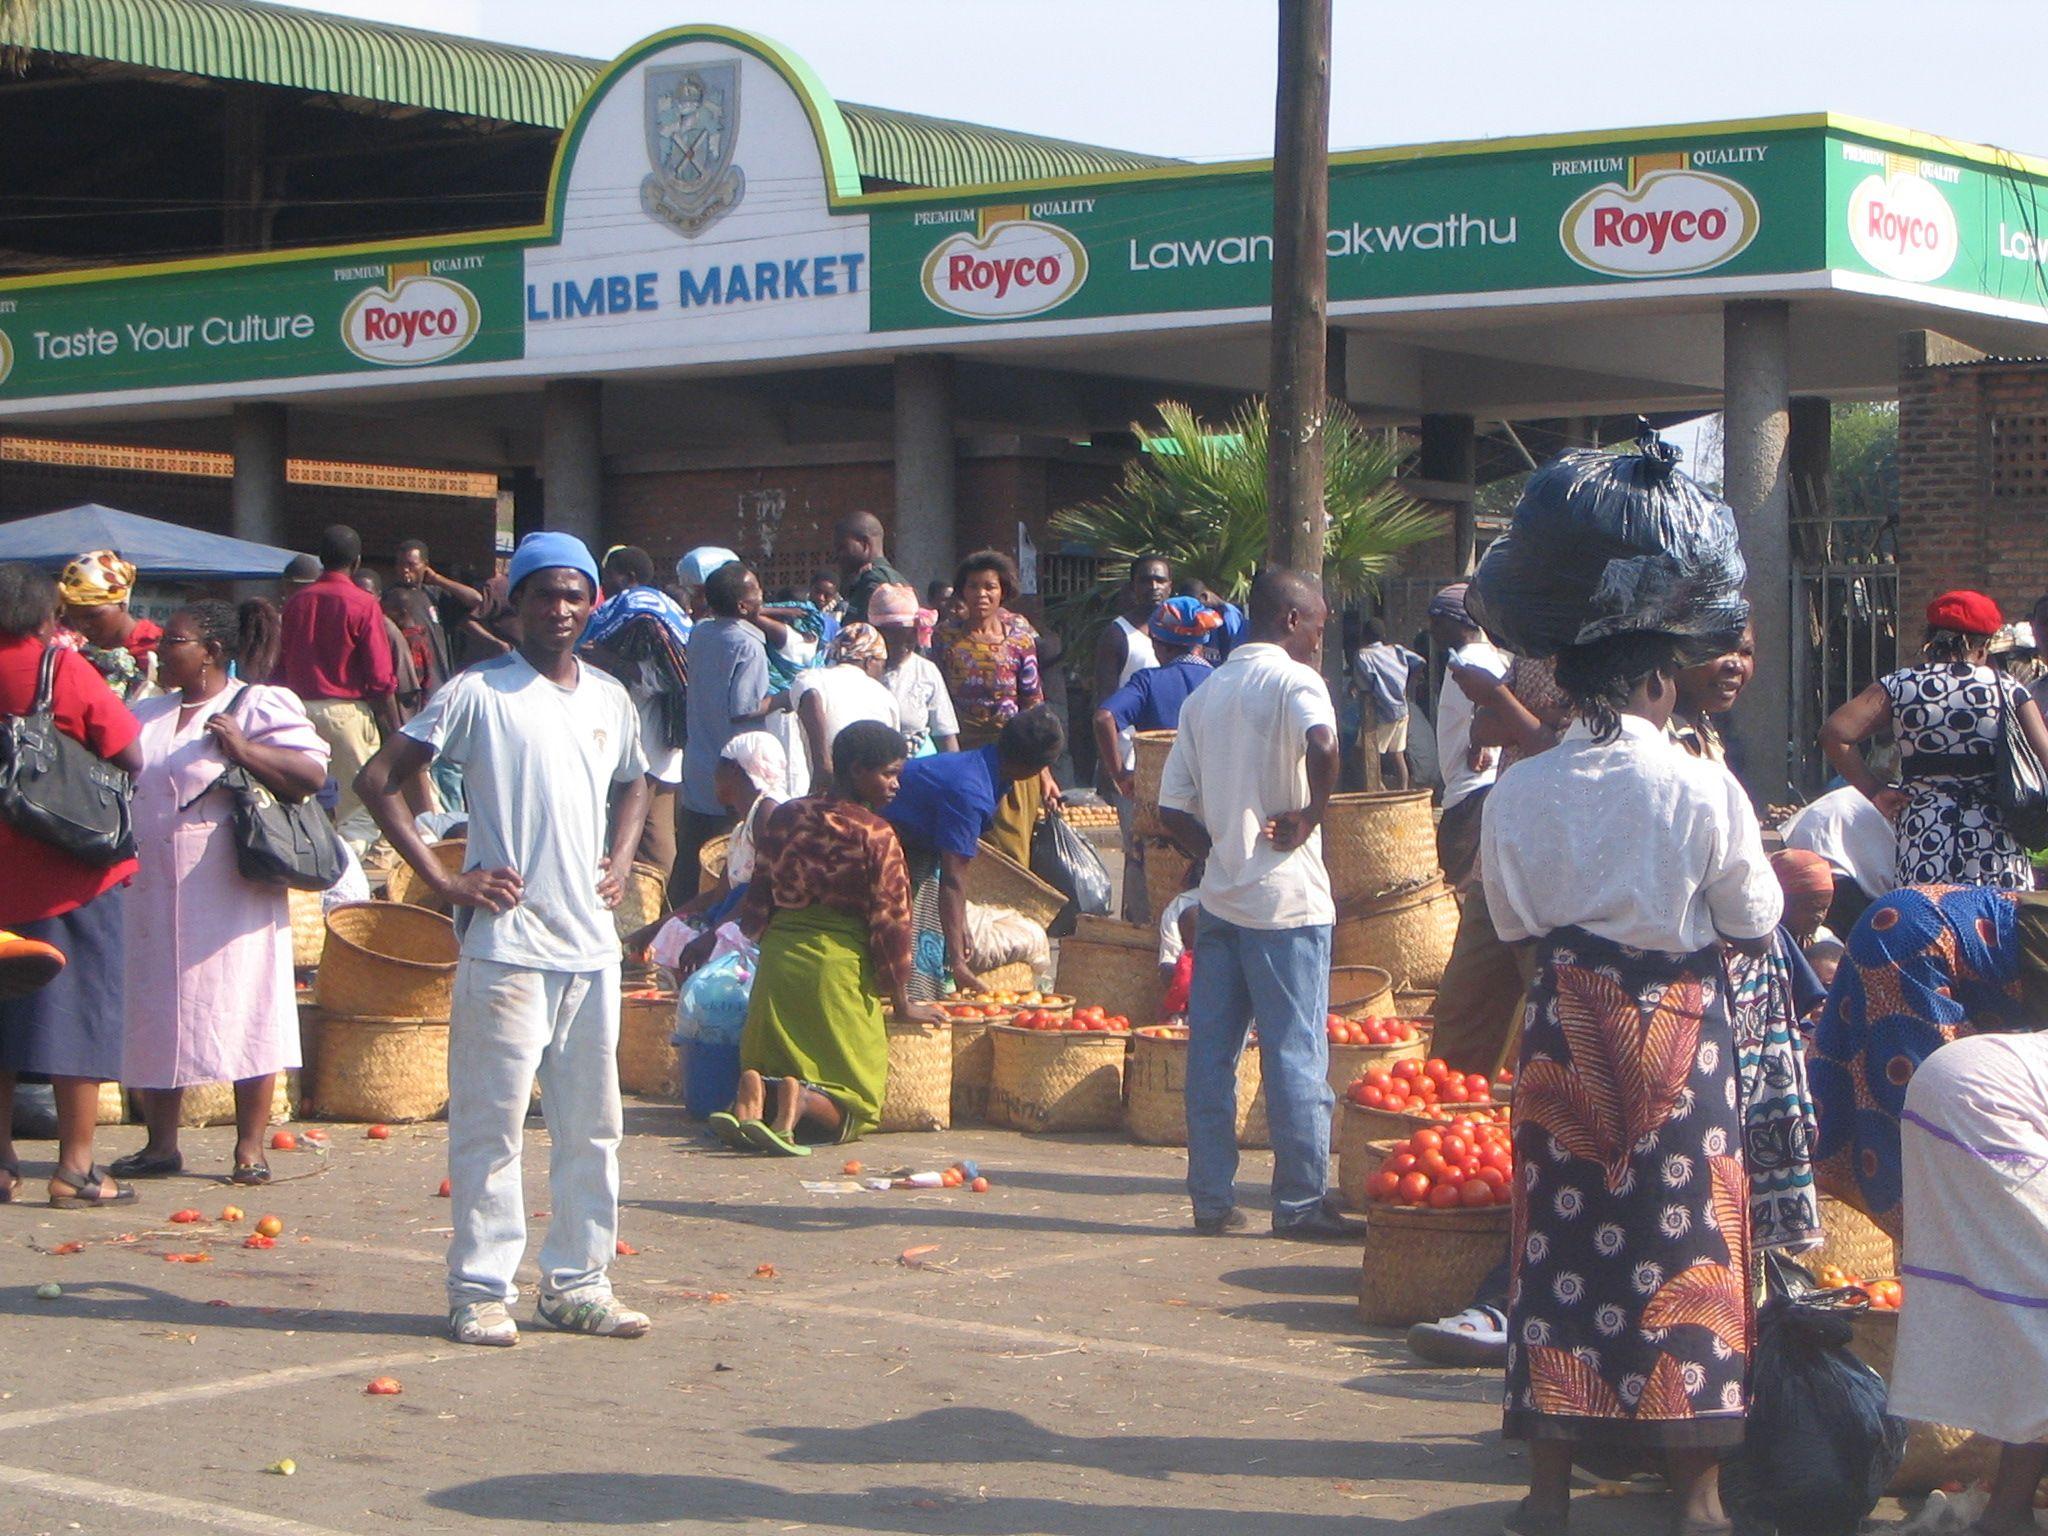 Entrance of limbe market